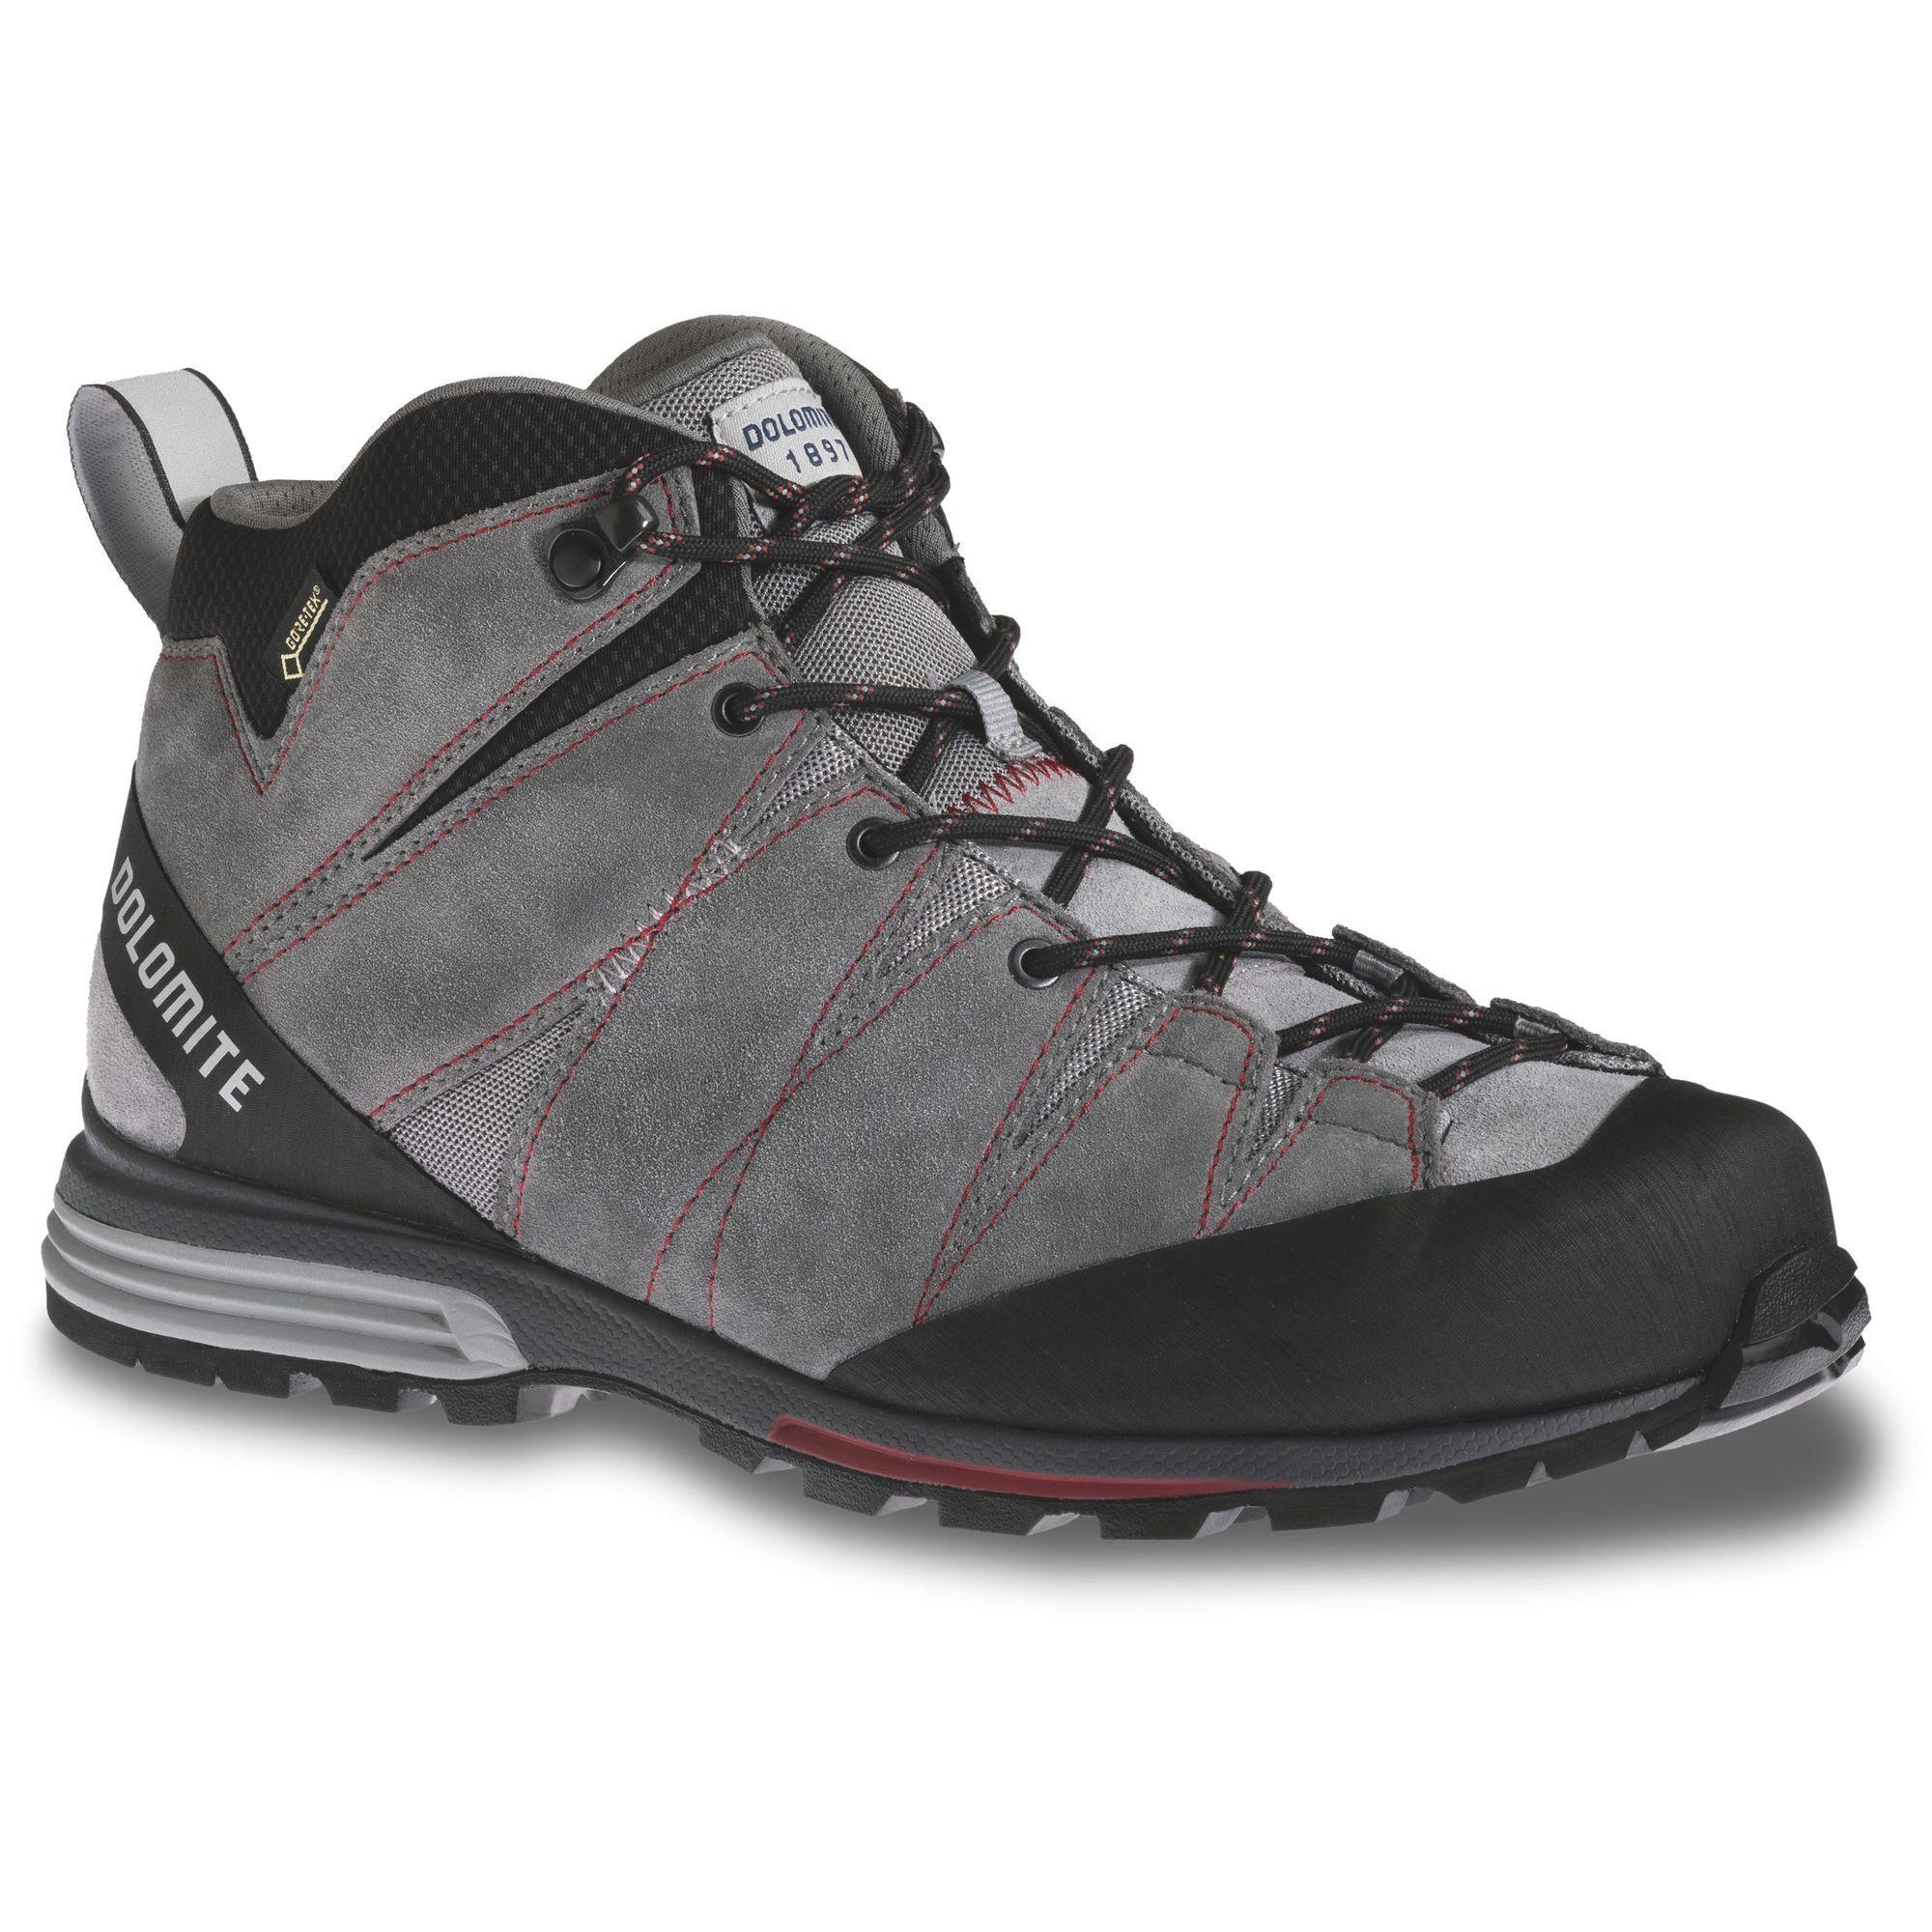 Dolomite »DOLOMIT DOL Diagonal Pro Mid GTX Shoe« Outdoorschuh online kaufen | OTTO